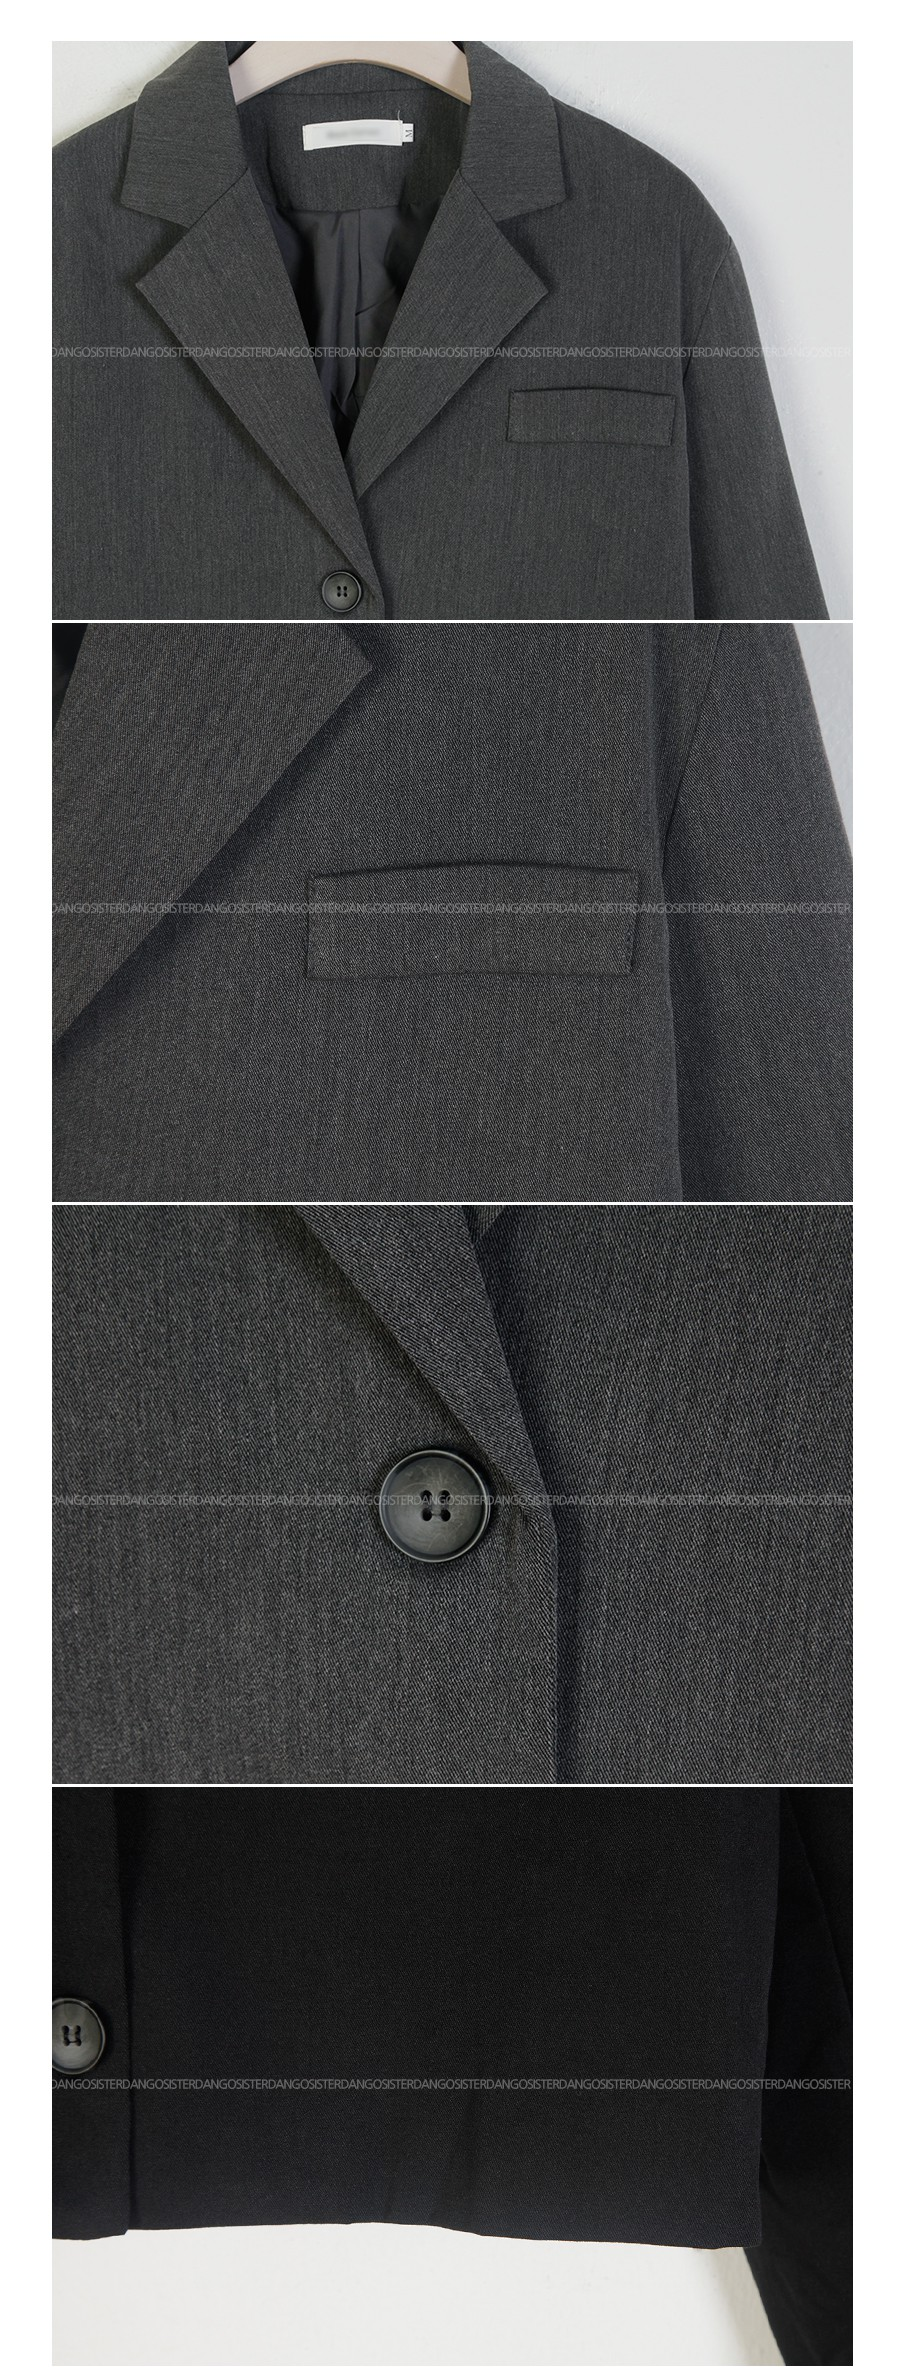 Planning Pop It Crop JK These days trending mini jacket :D